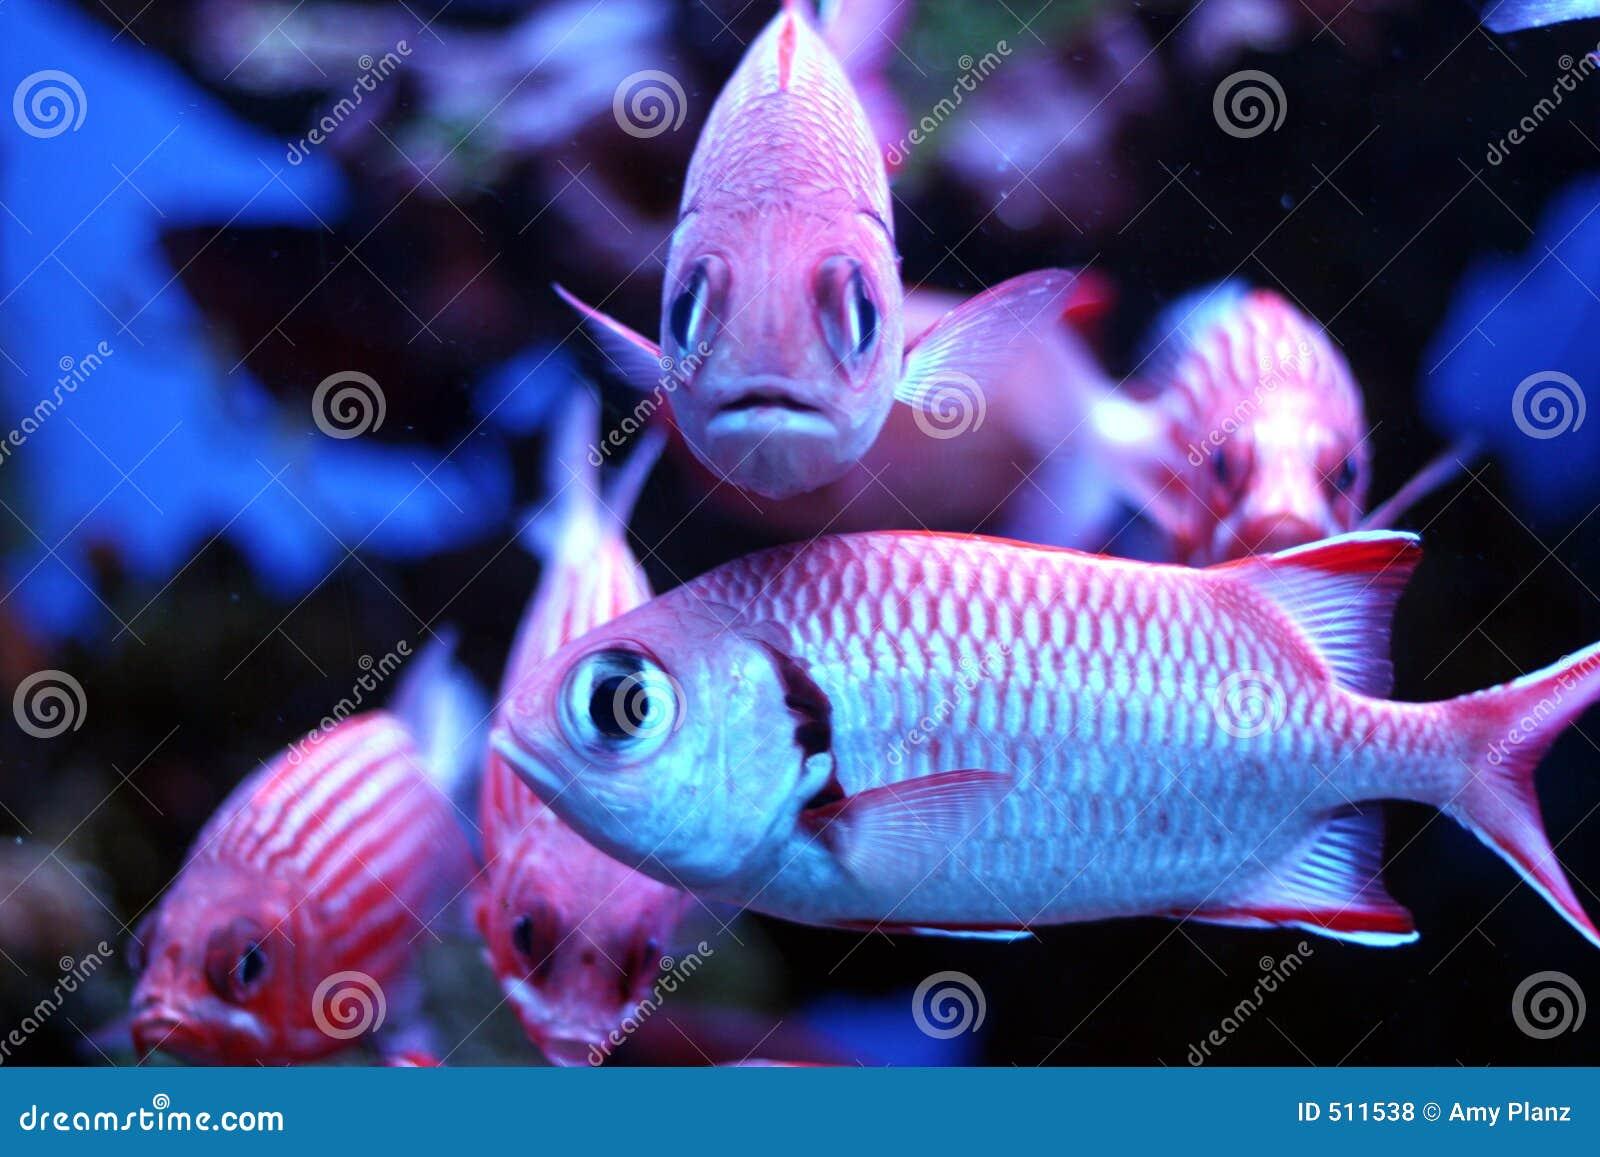 Tropical fish stock photo image of hawaii scales for Tropic fish hawaii